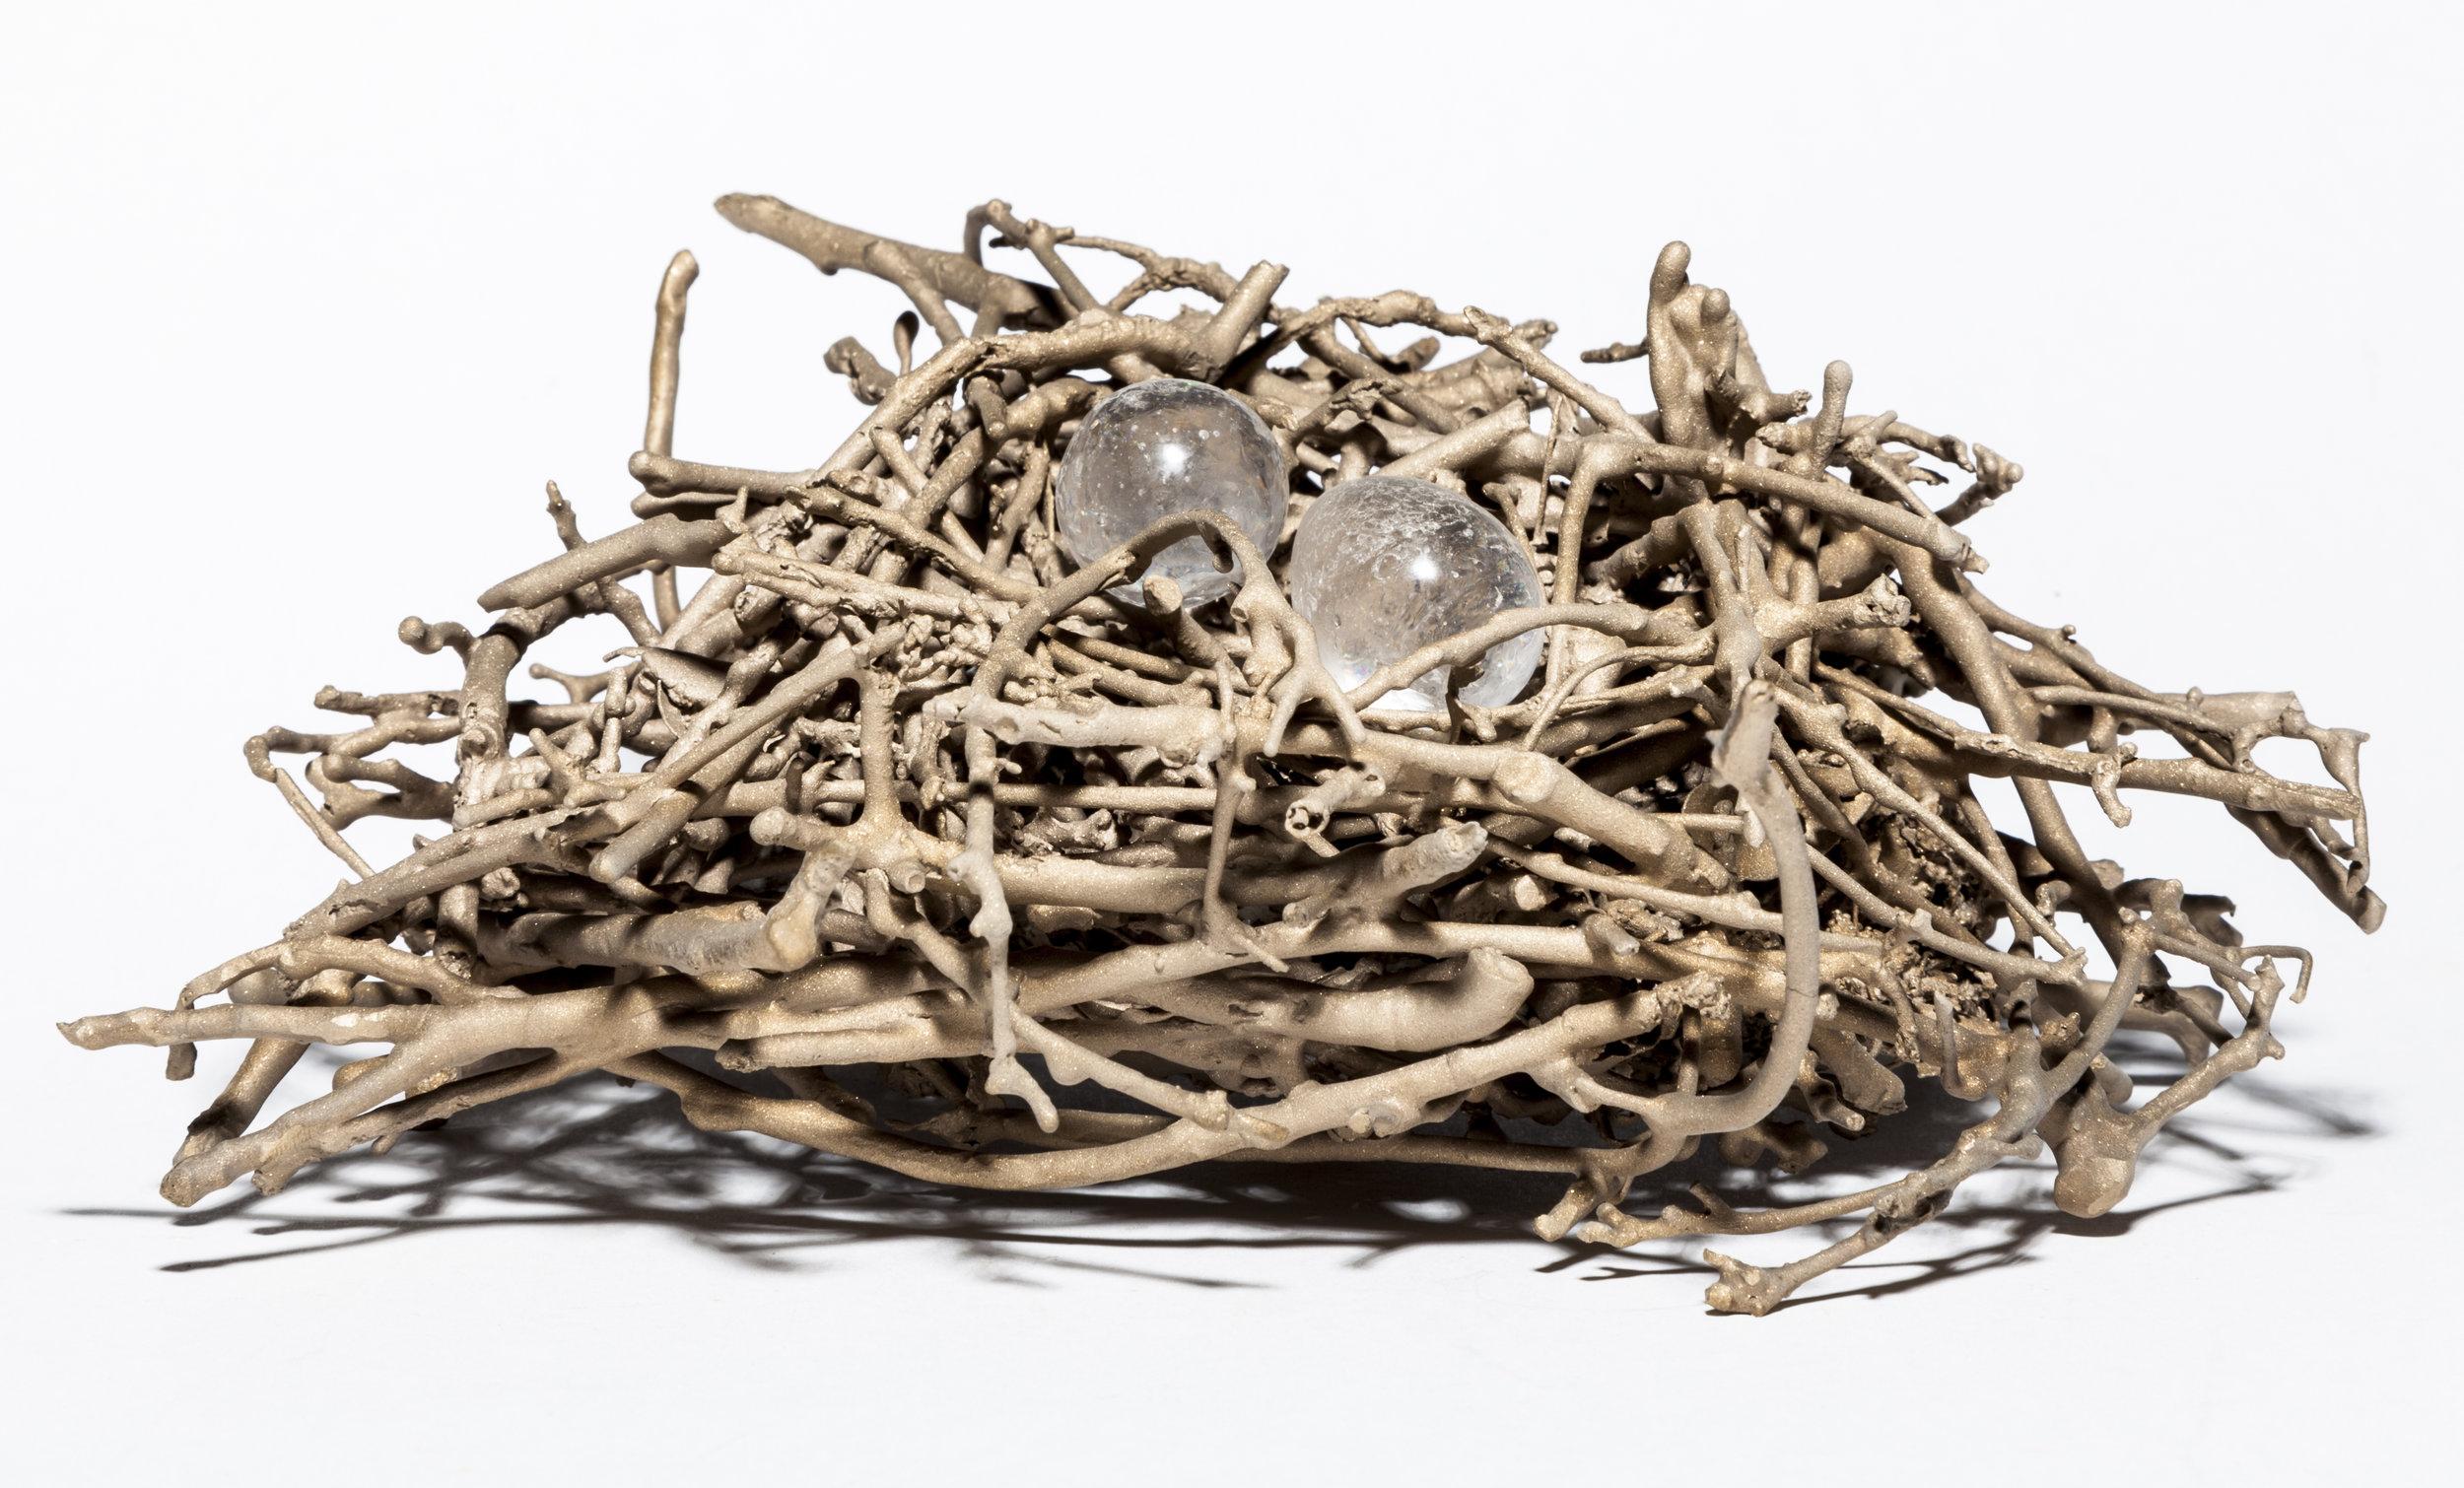 BaleCreekAllen Nests-033.jpg